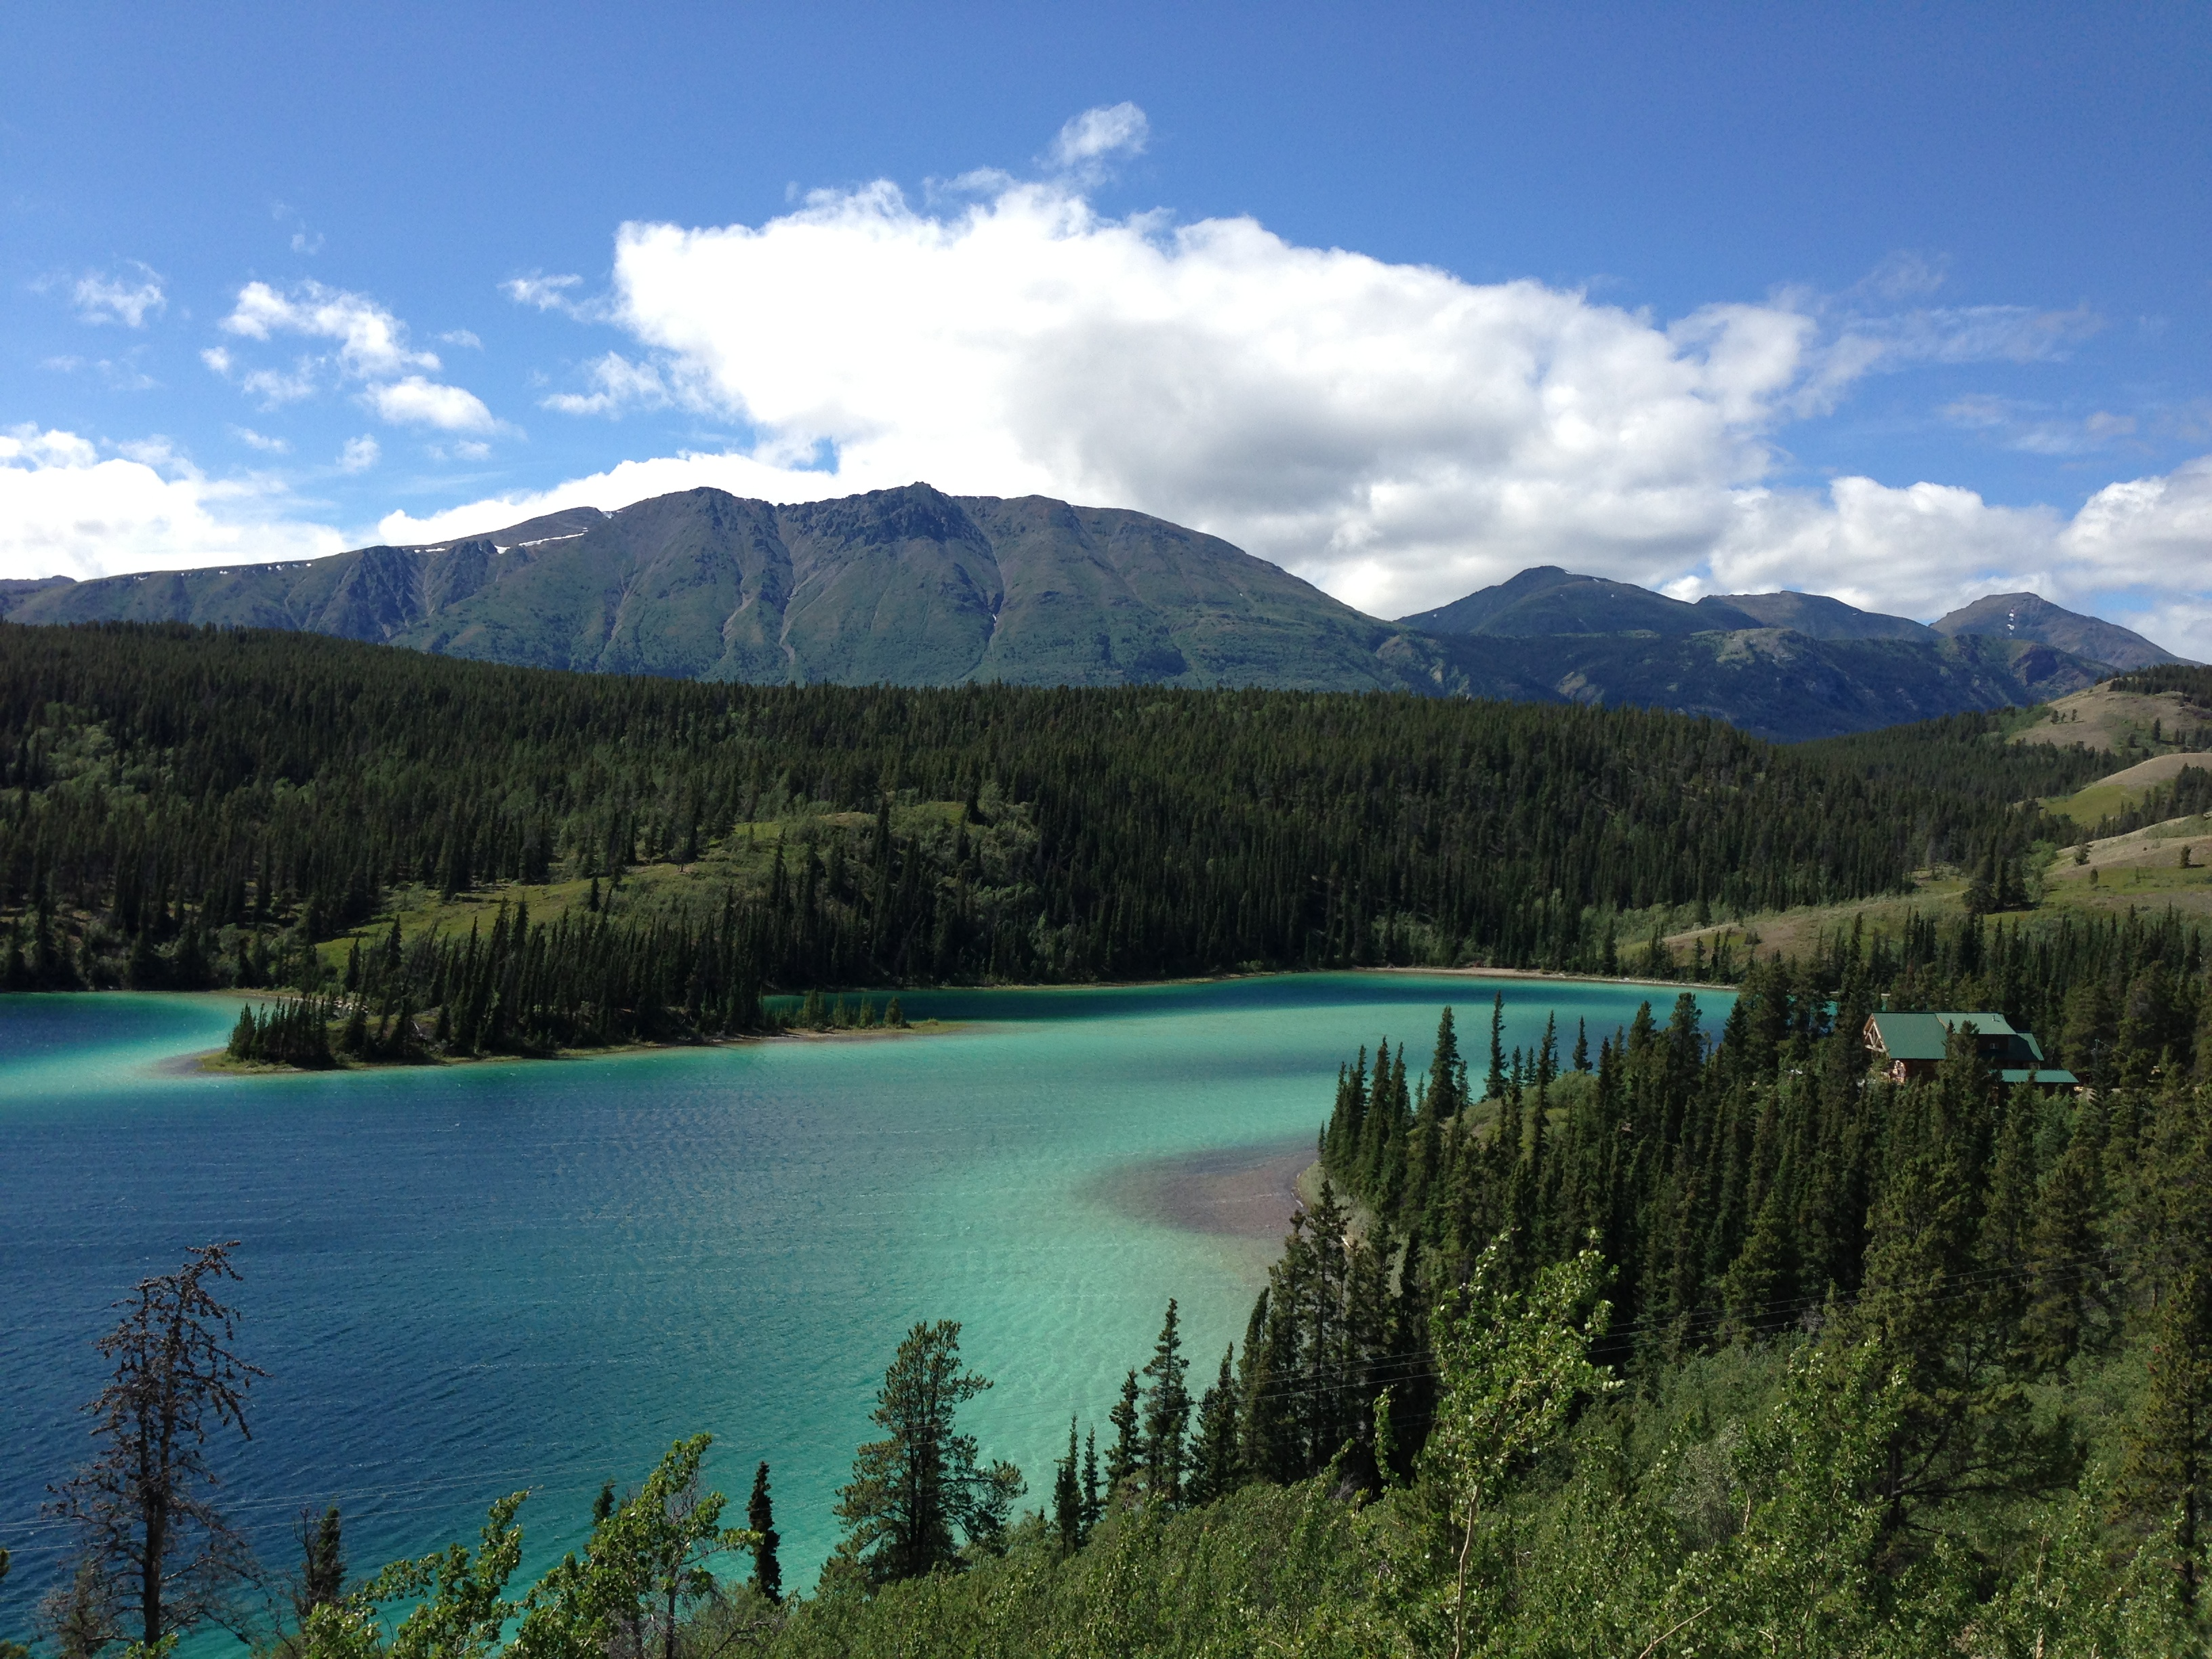 Skagway and the Great Yukon